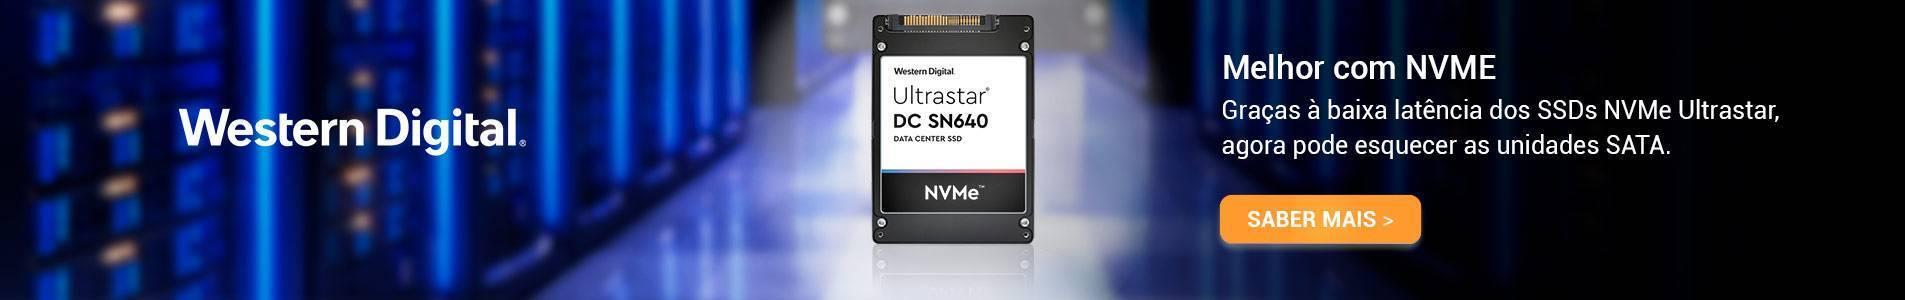 Banner-WD-Ultrastar-DC-SN640